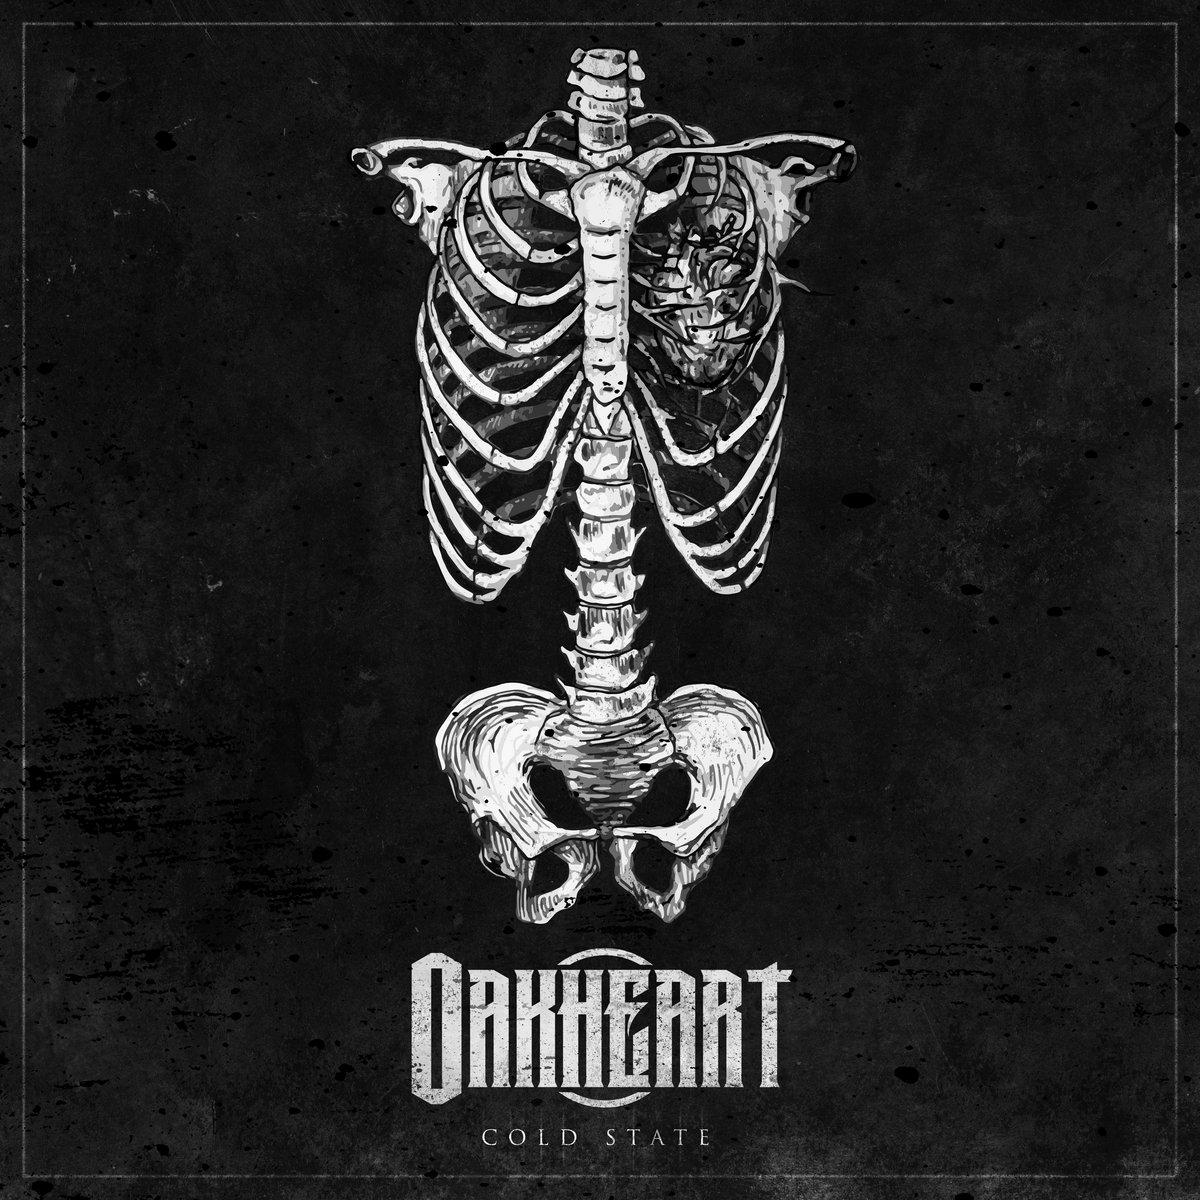 Oakheart - Cold State (2018)